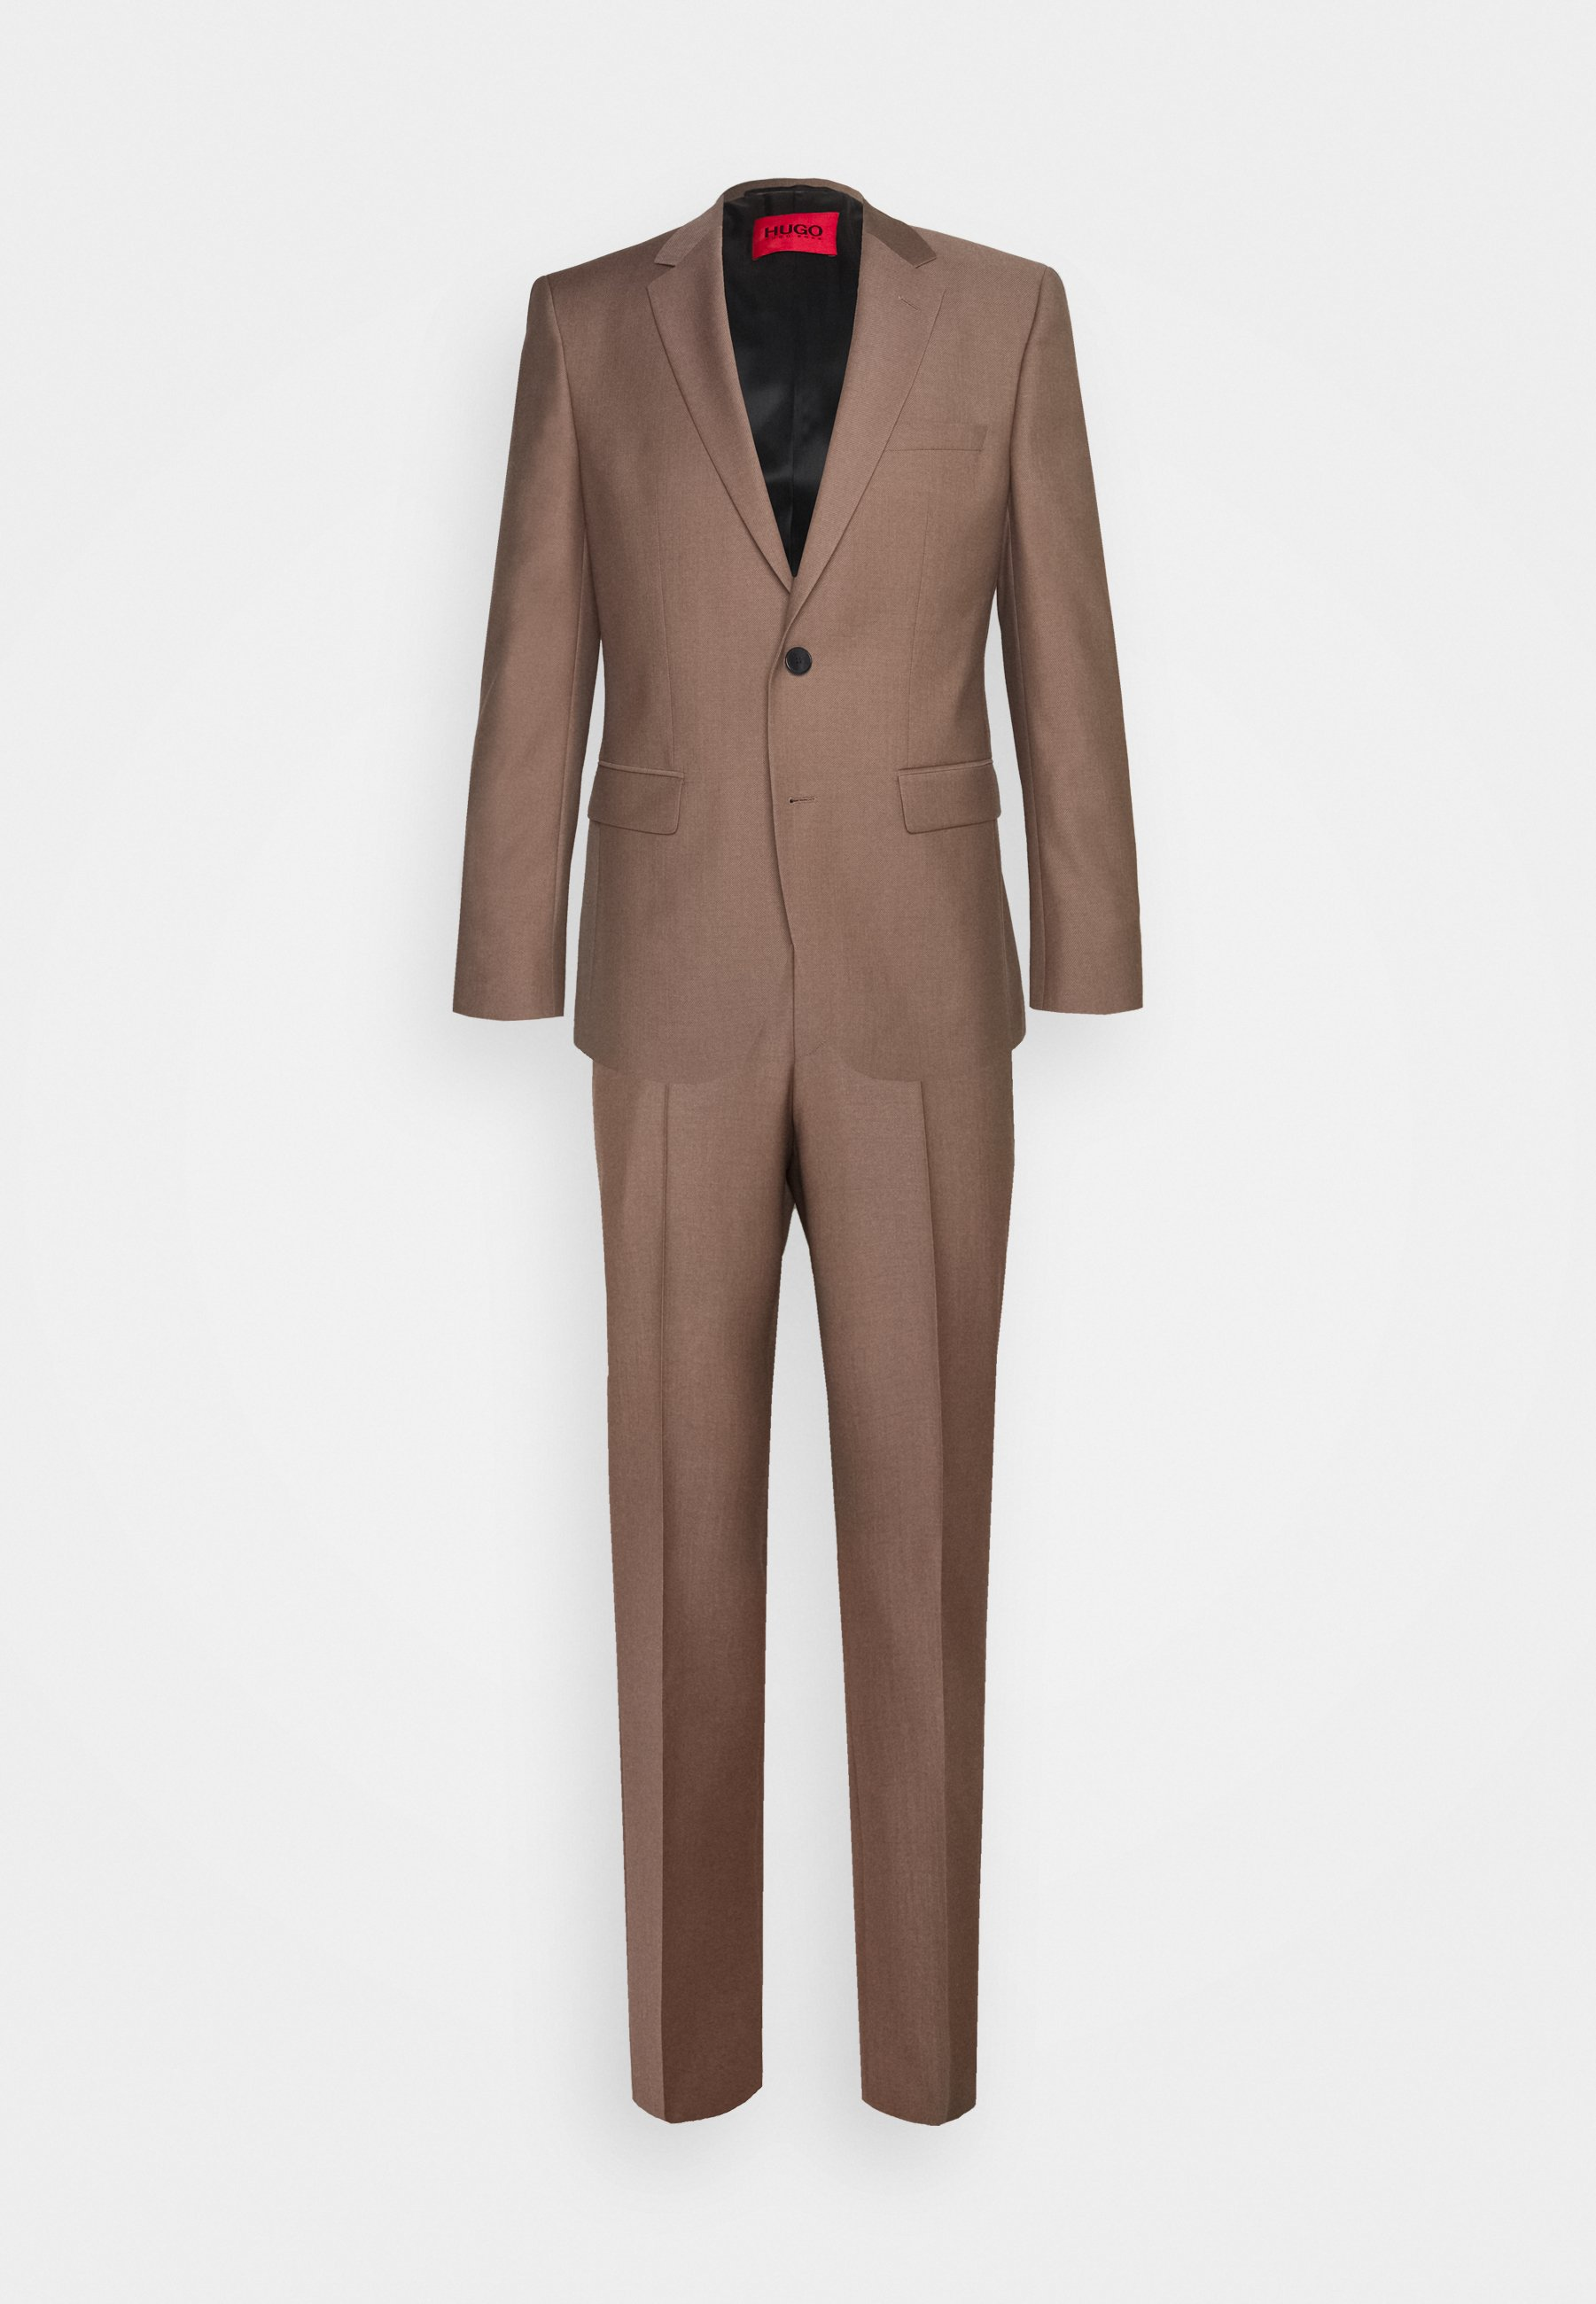 Men JEFFERY SIMMONS - Suit